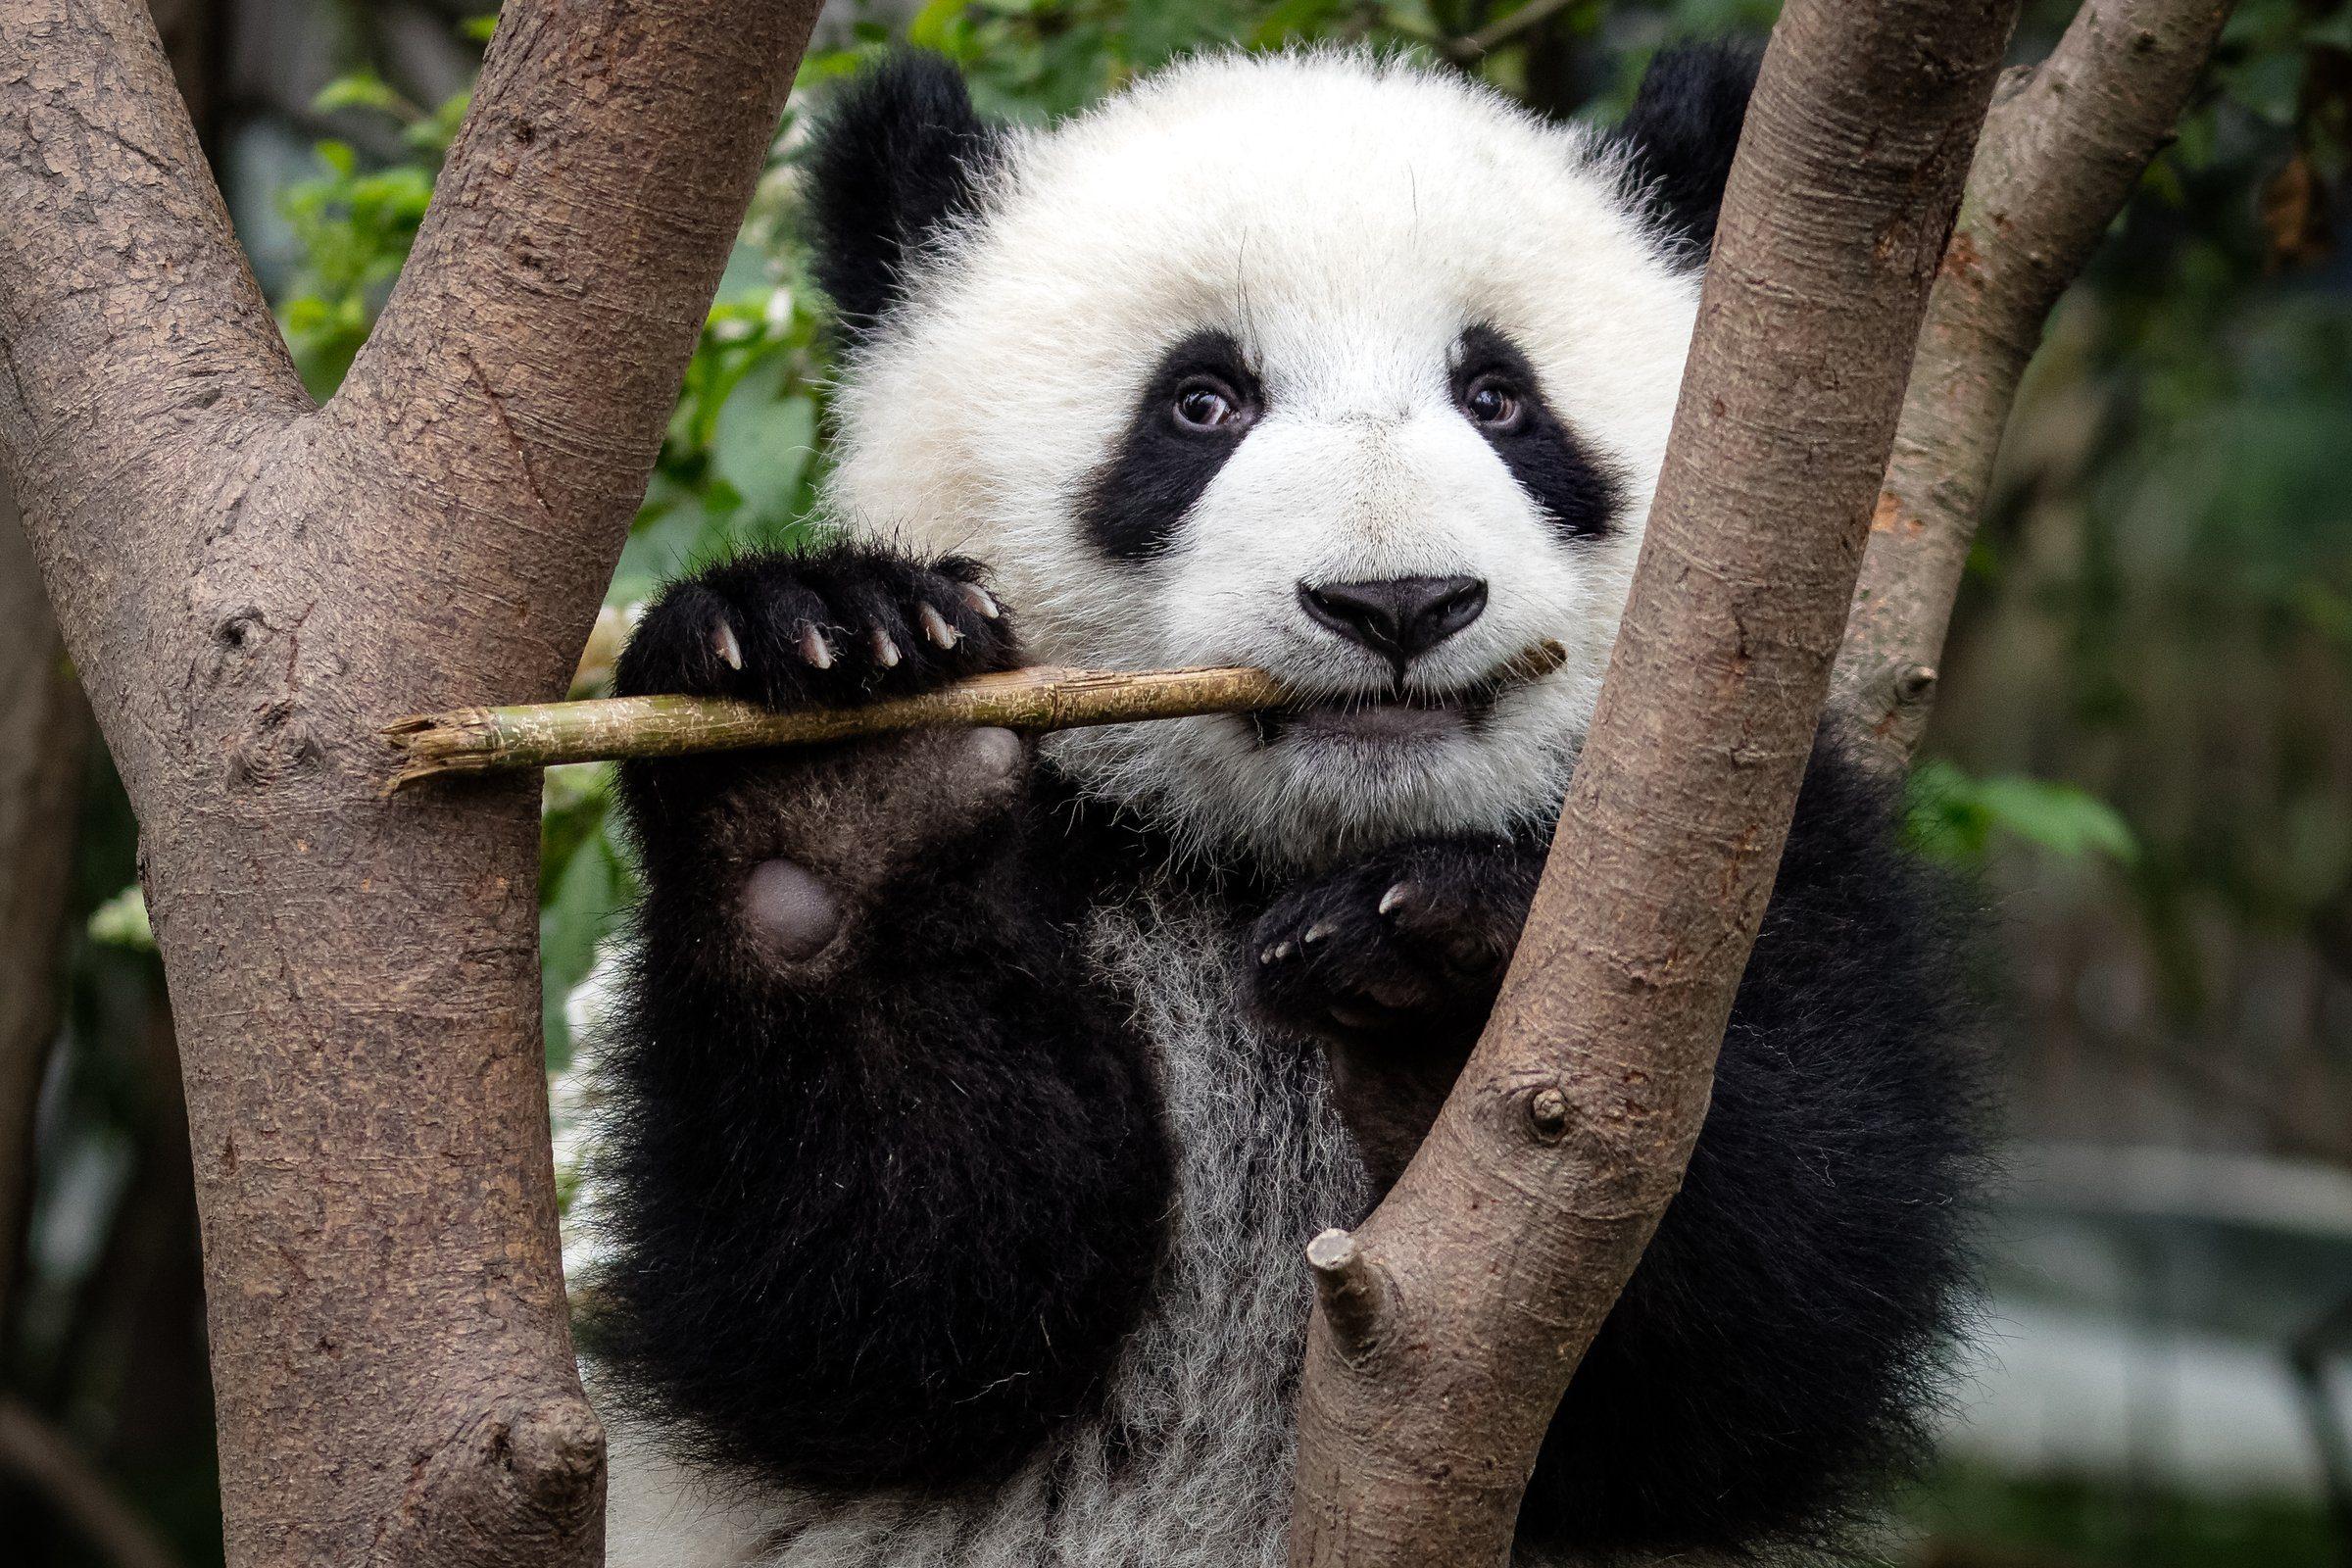 Panda (Ailuropoda melanoleuca)